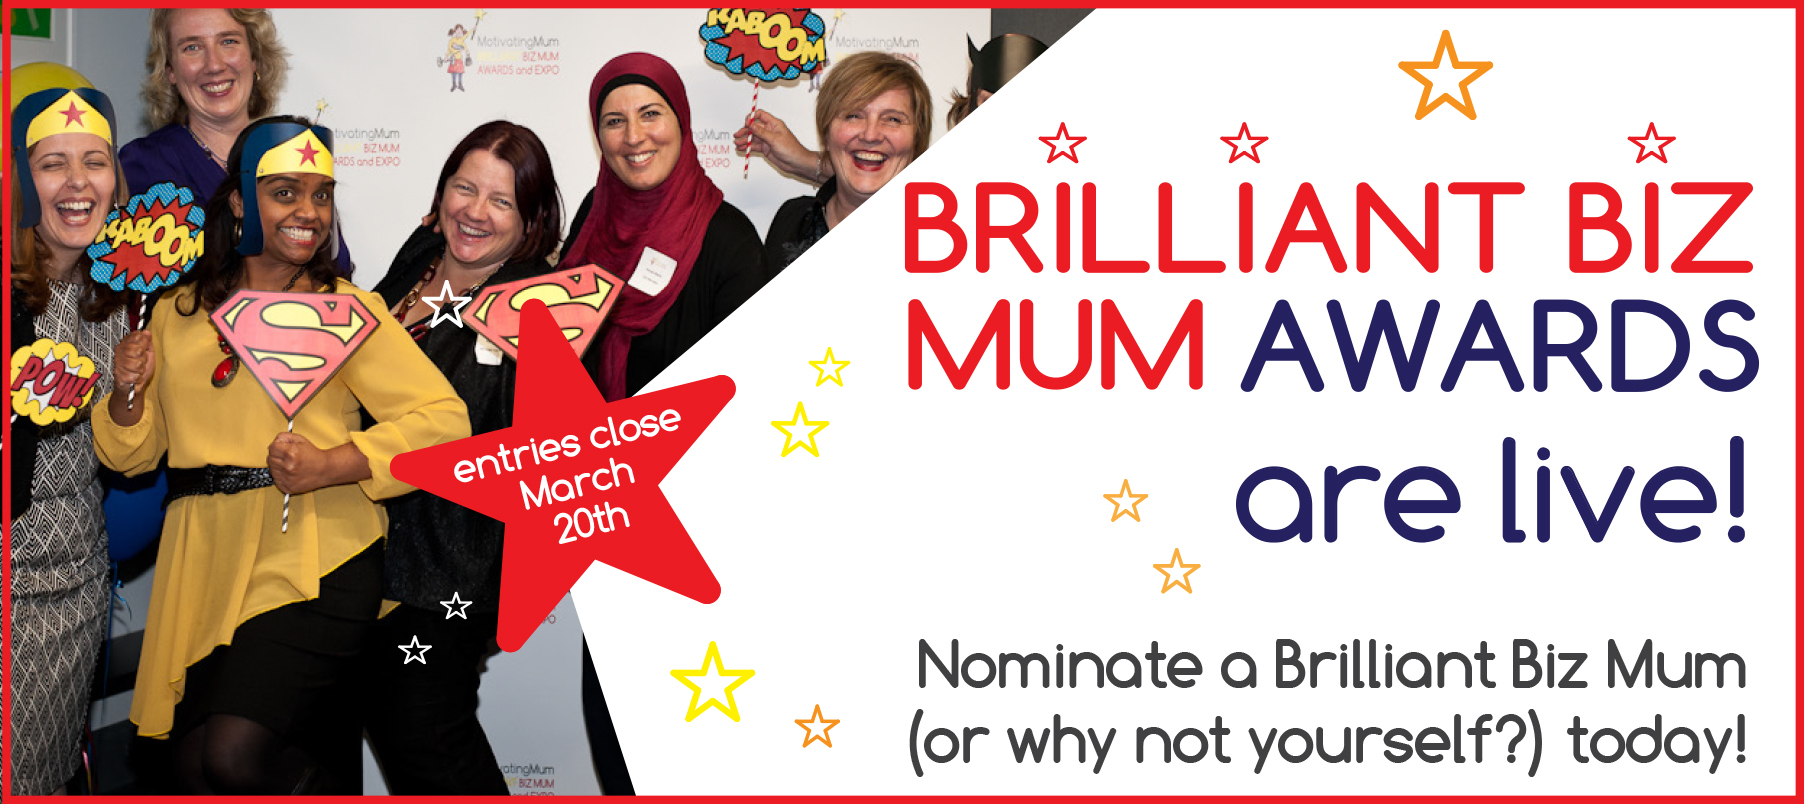 Brilliant Biz Mum Awards